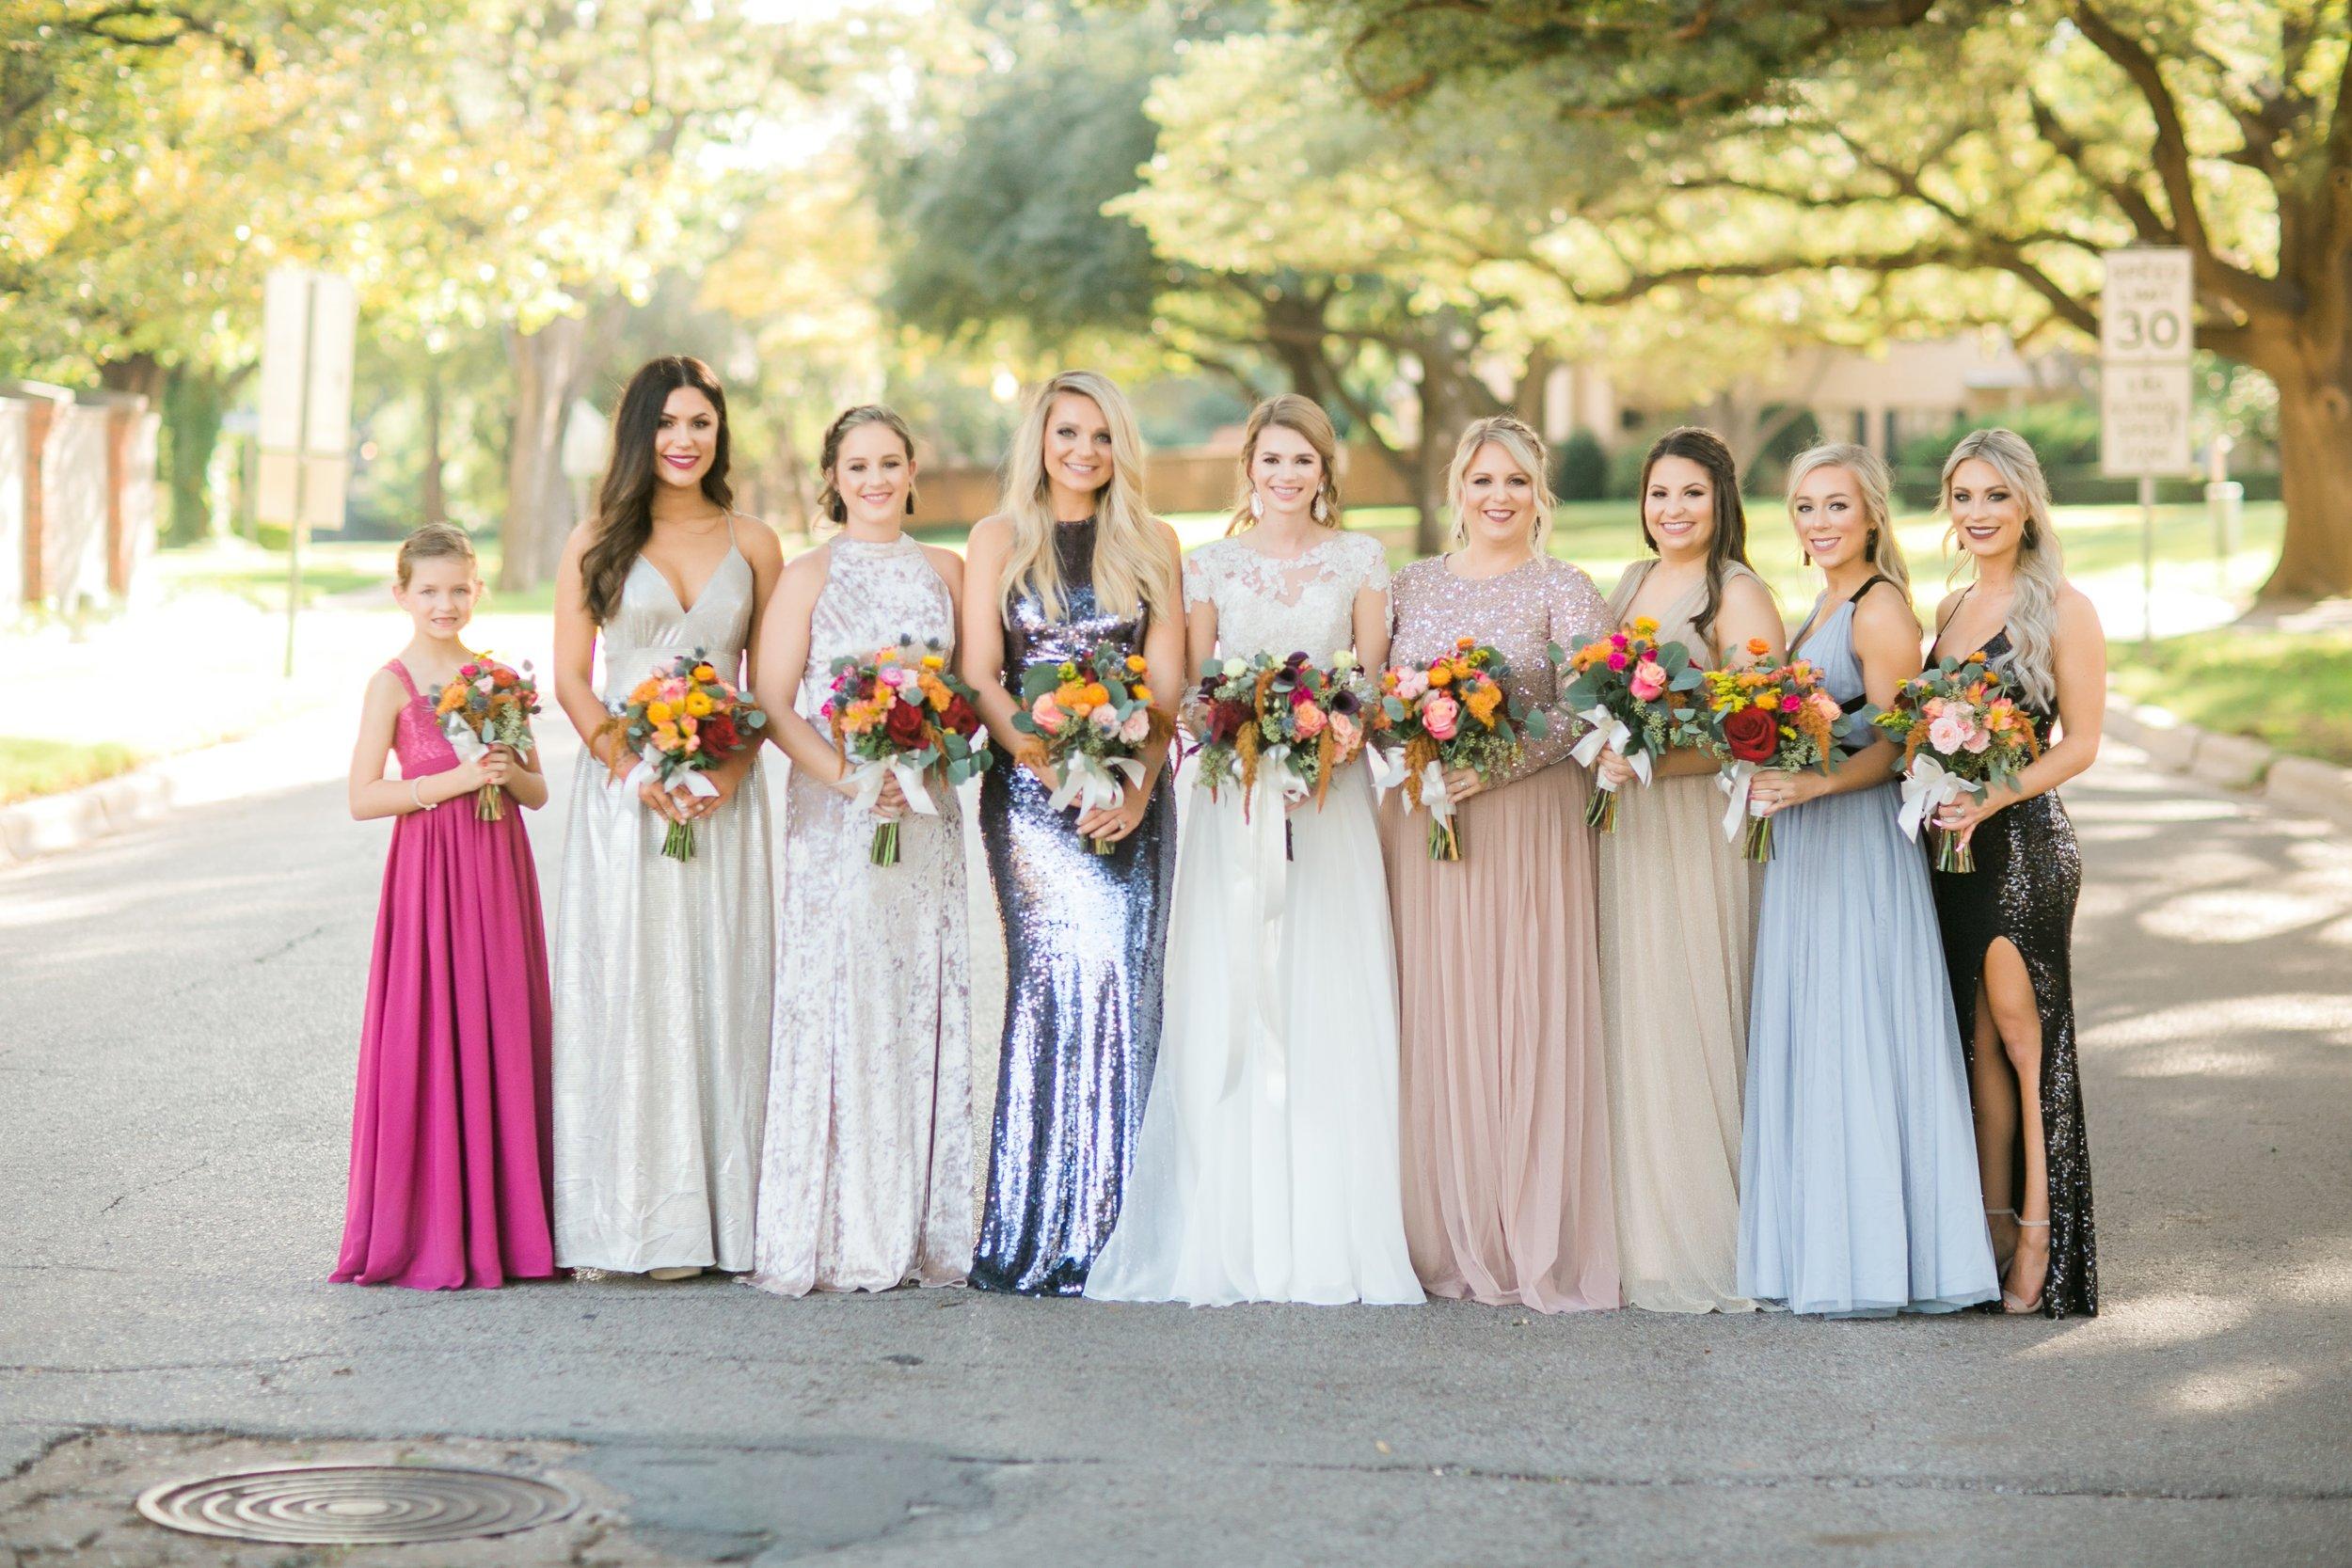 Roberson-Wedding-The-Forum-Lauren-Pinson-Wedding-Photography-Wichita-Falls-Texas-051.jpg